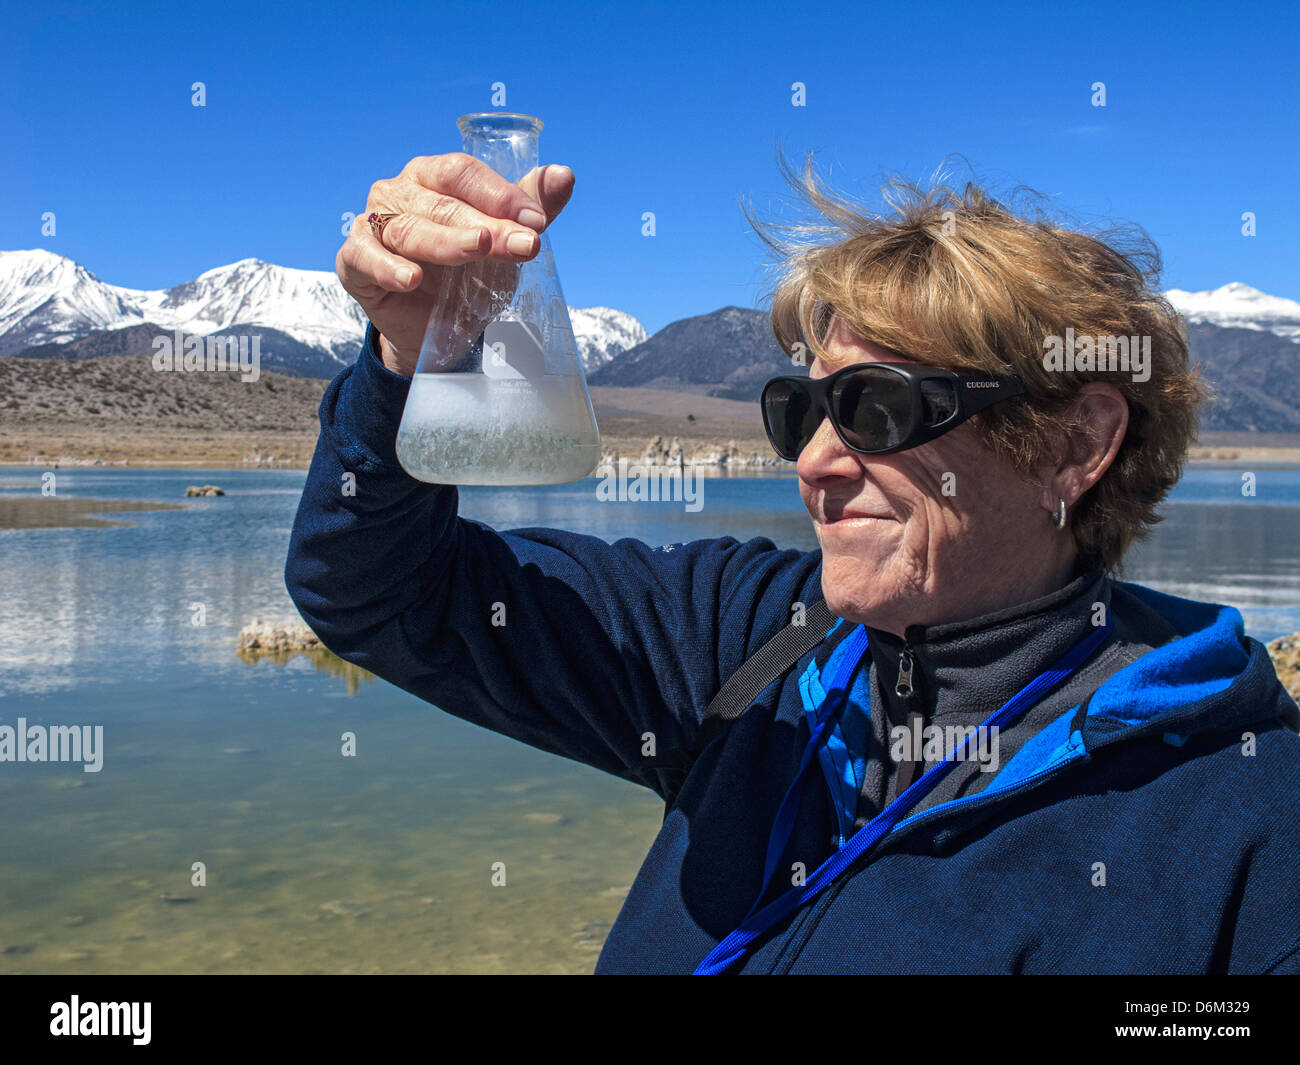 Making making tufa in glass beaker at Mono Lake in California - Stock Image